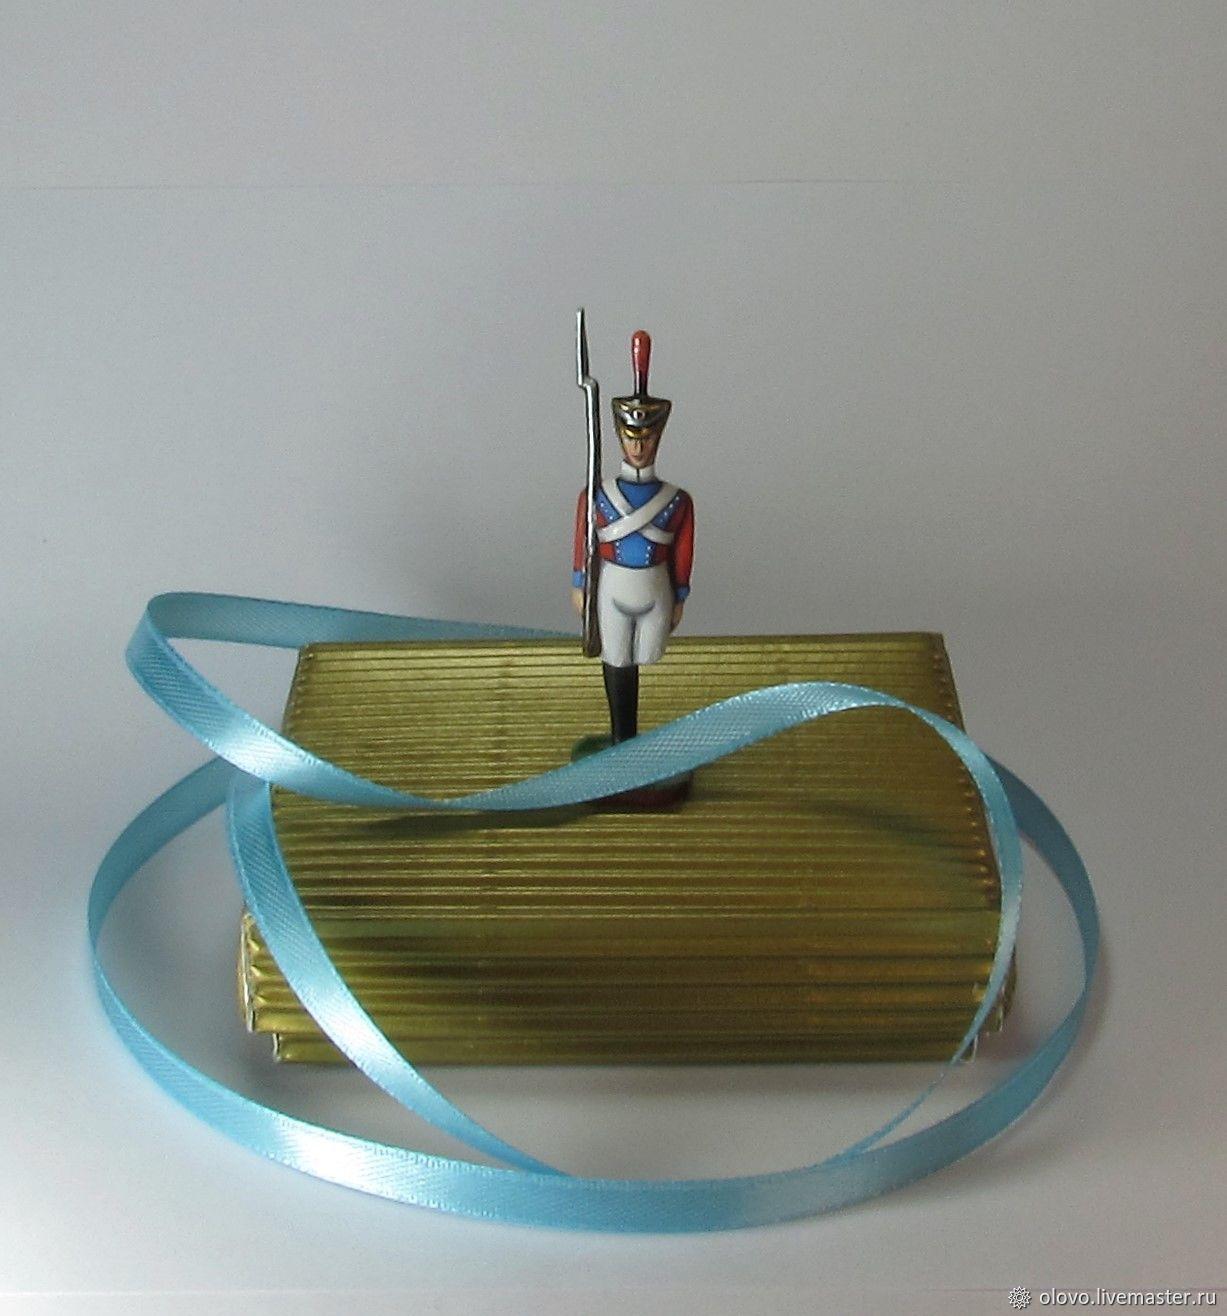 монтаж стойка оловянного солдатика картинки частыми местами